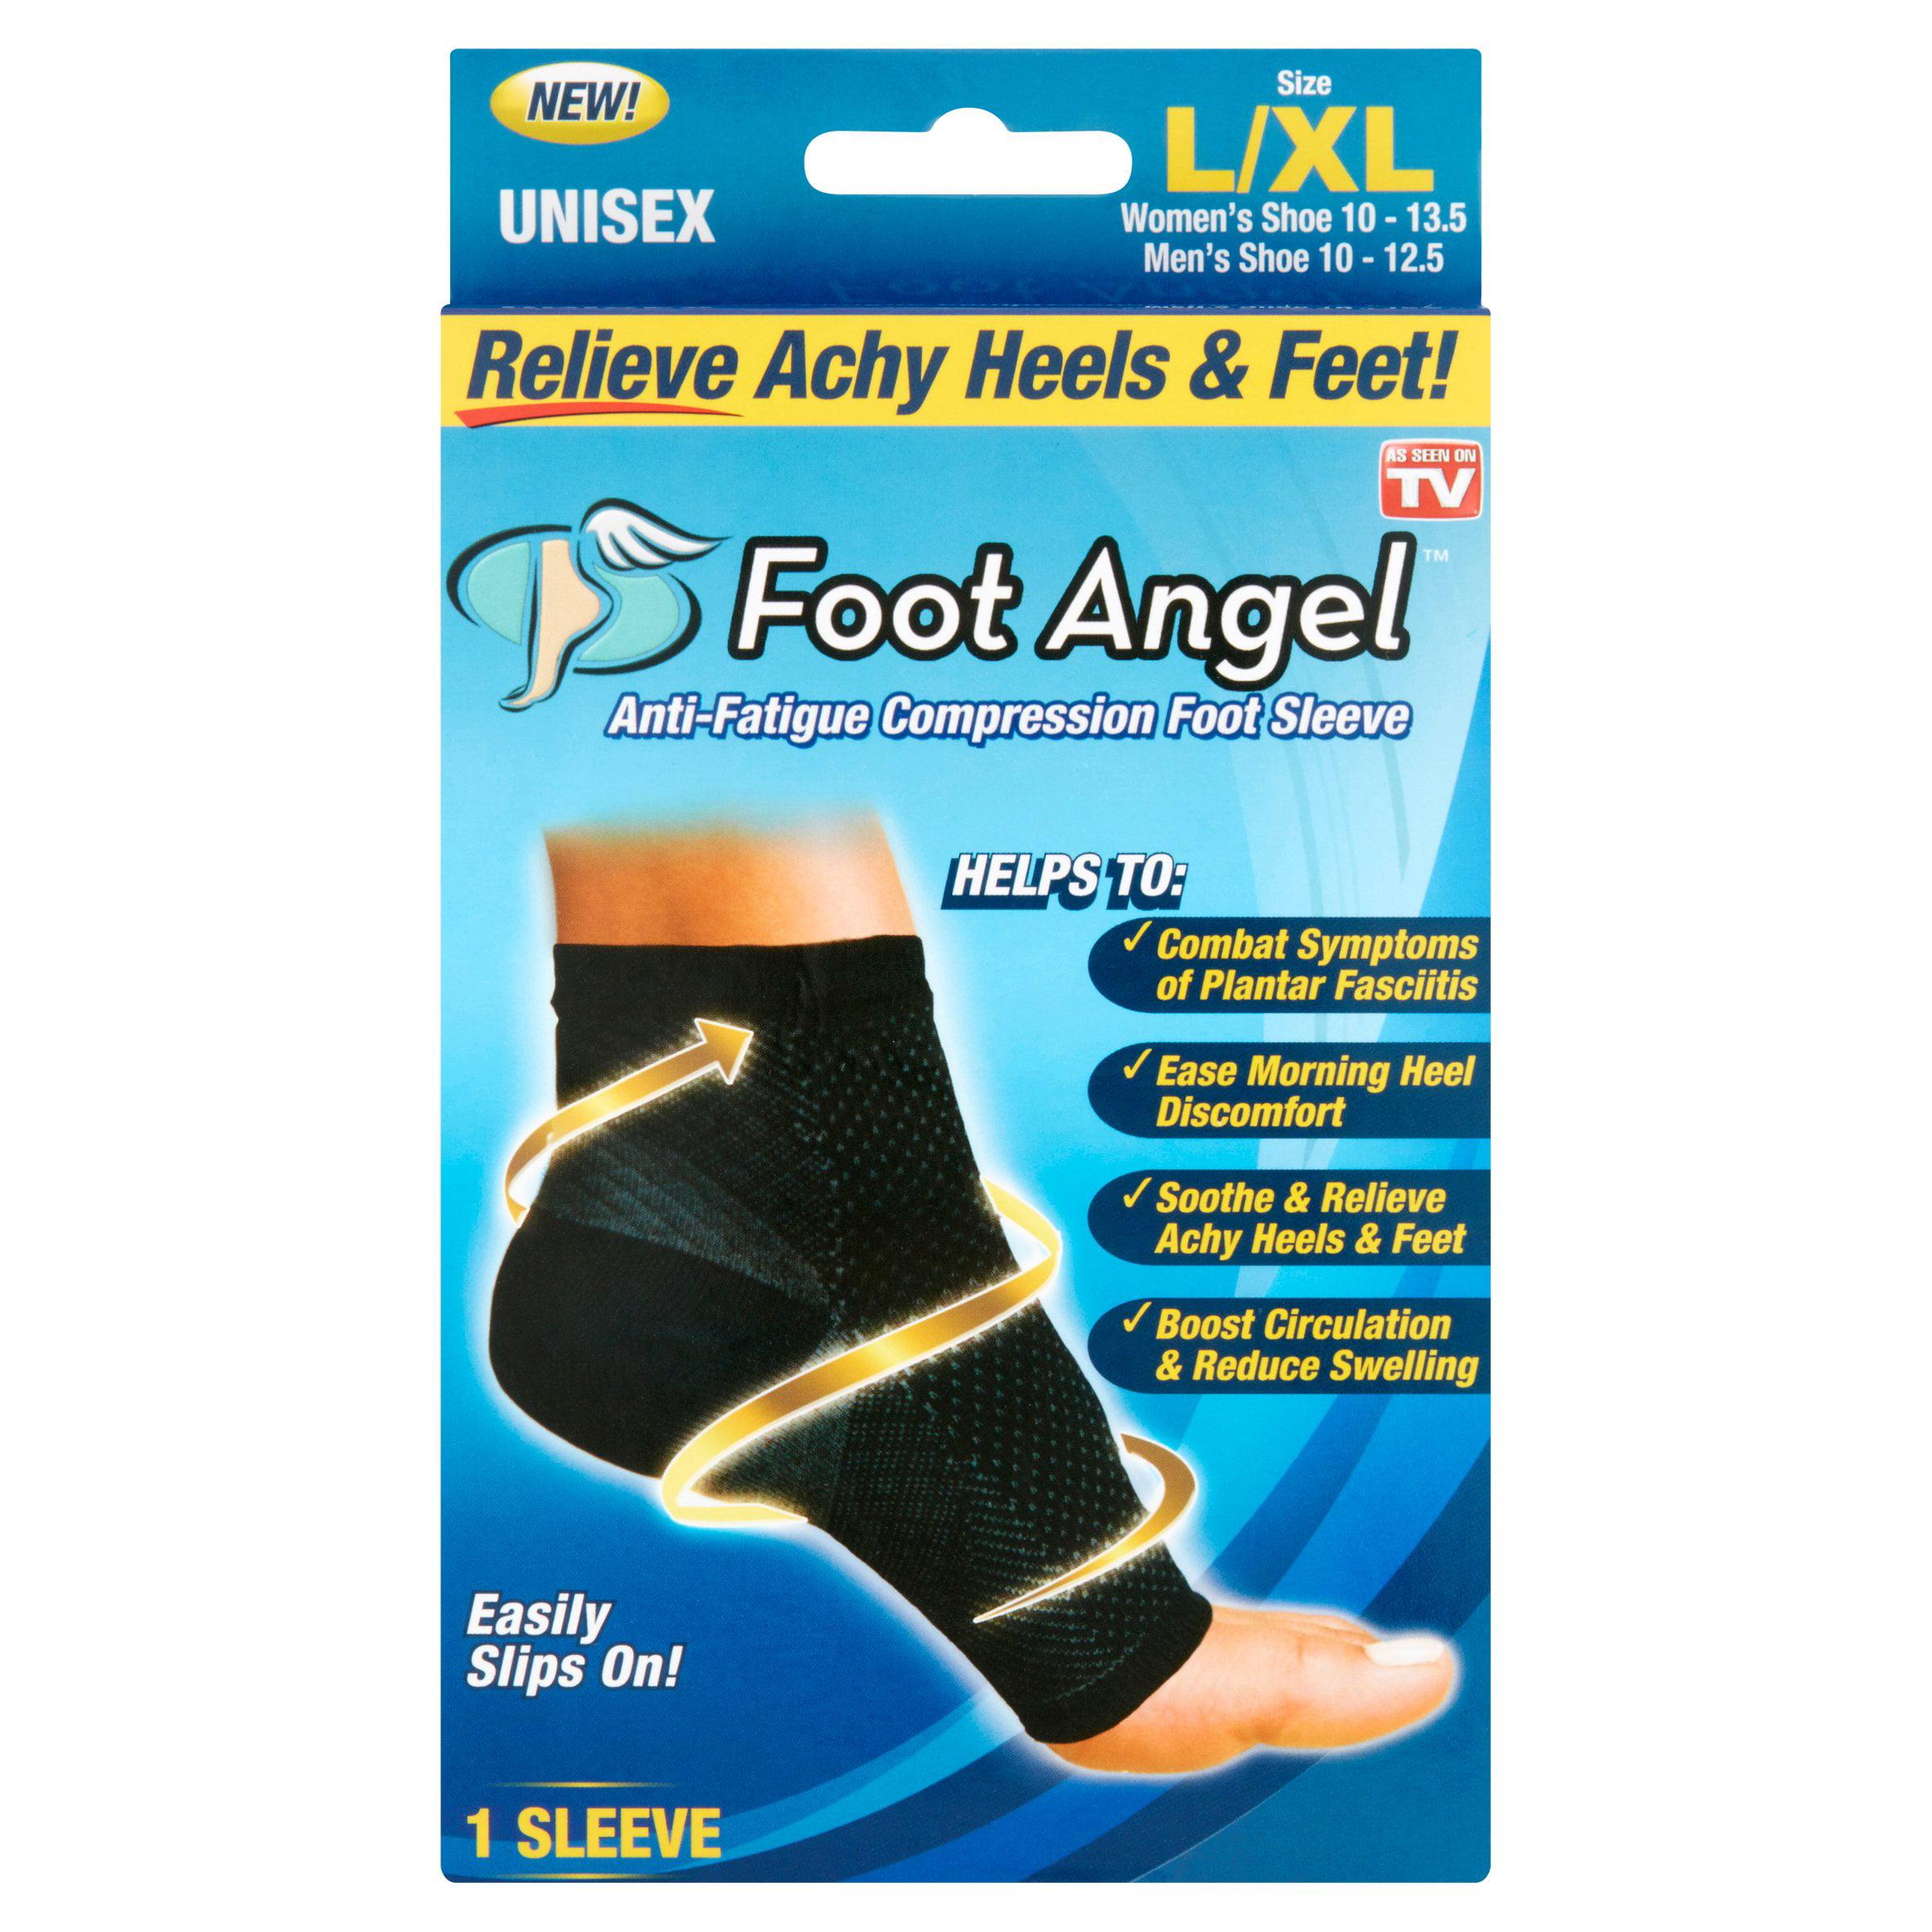 As Seen on TV Foot Angel, L/XL